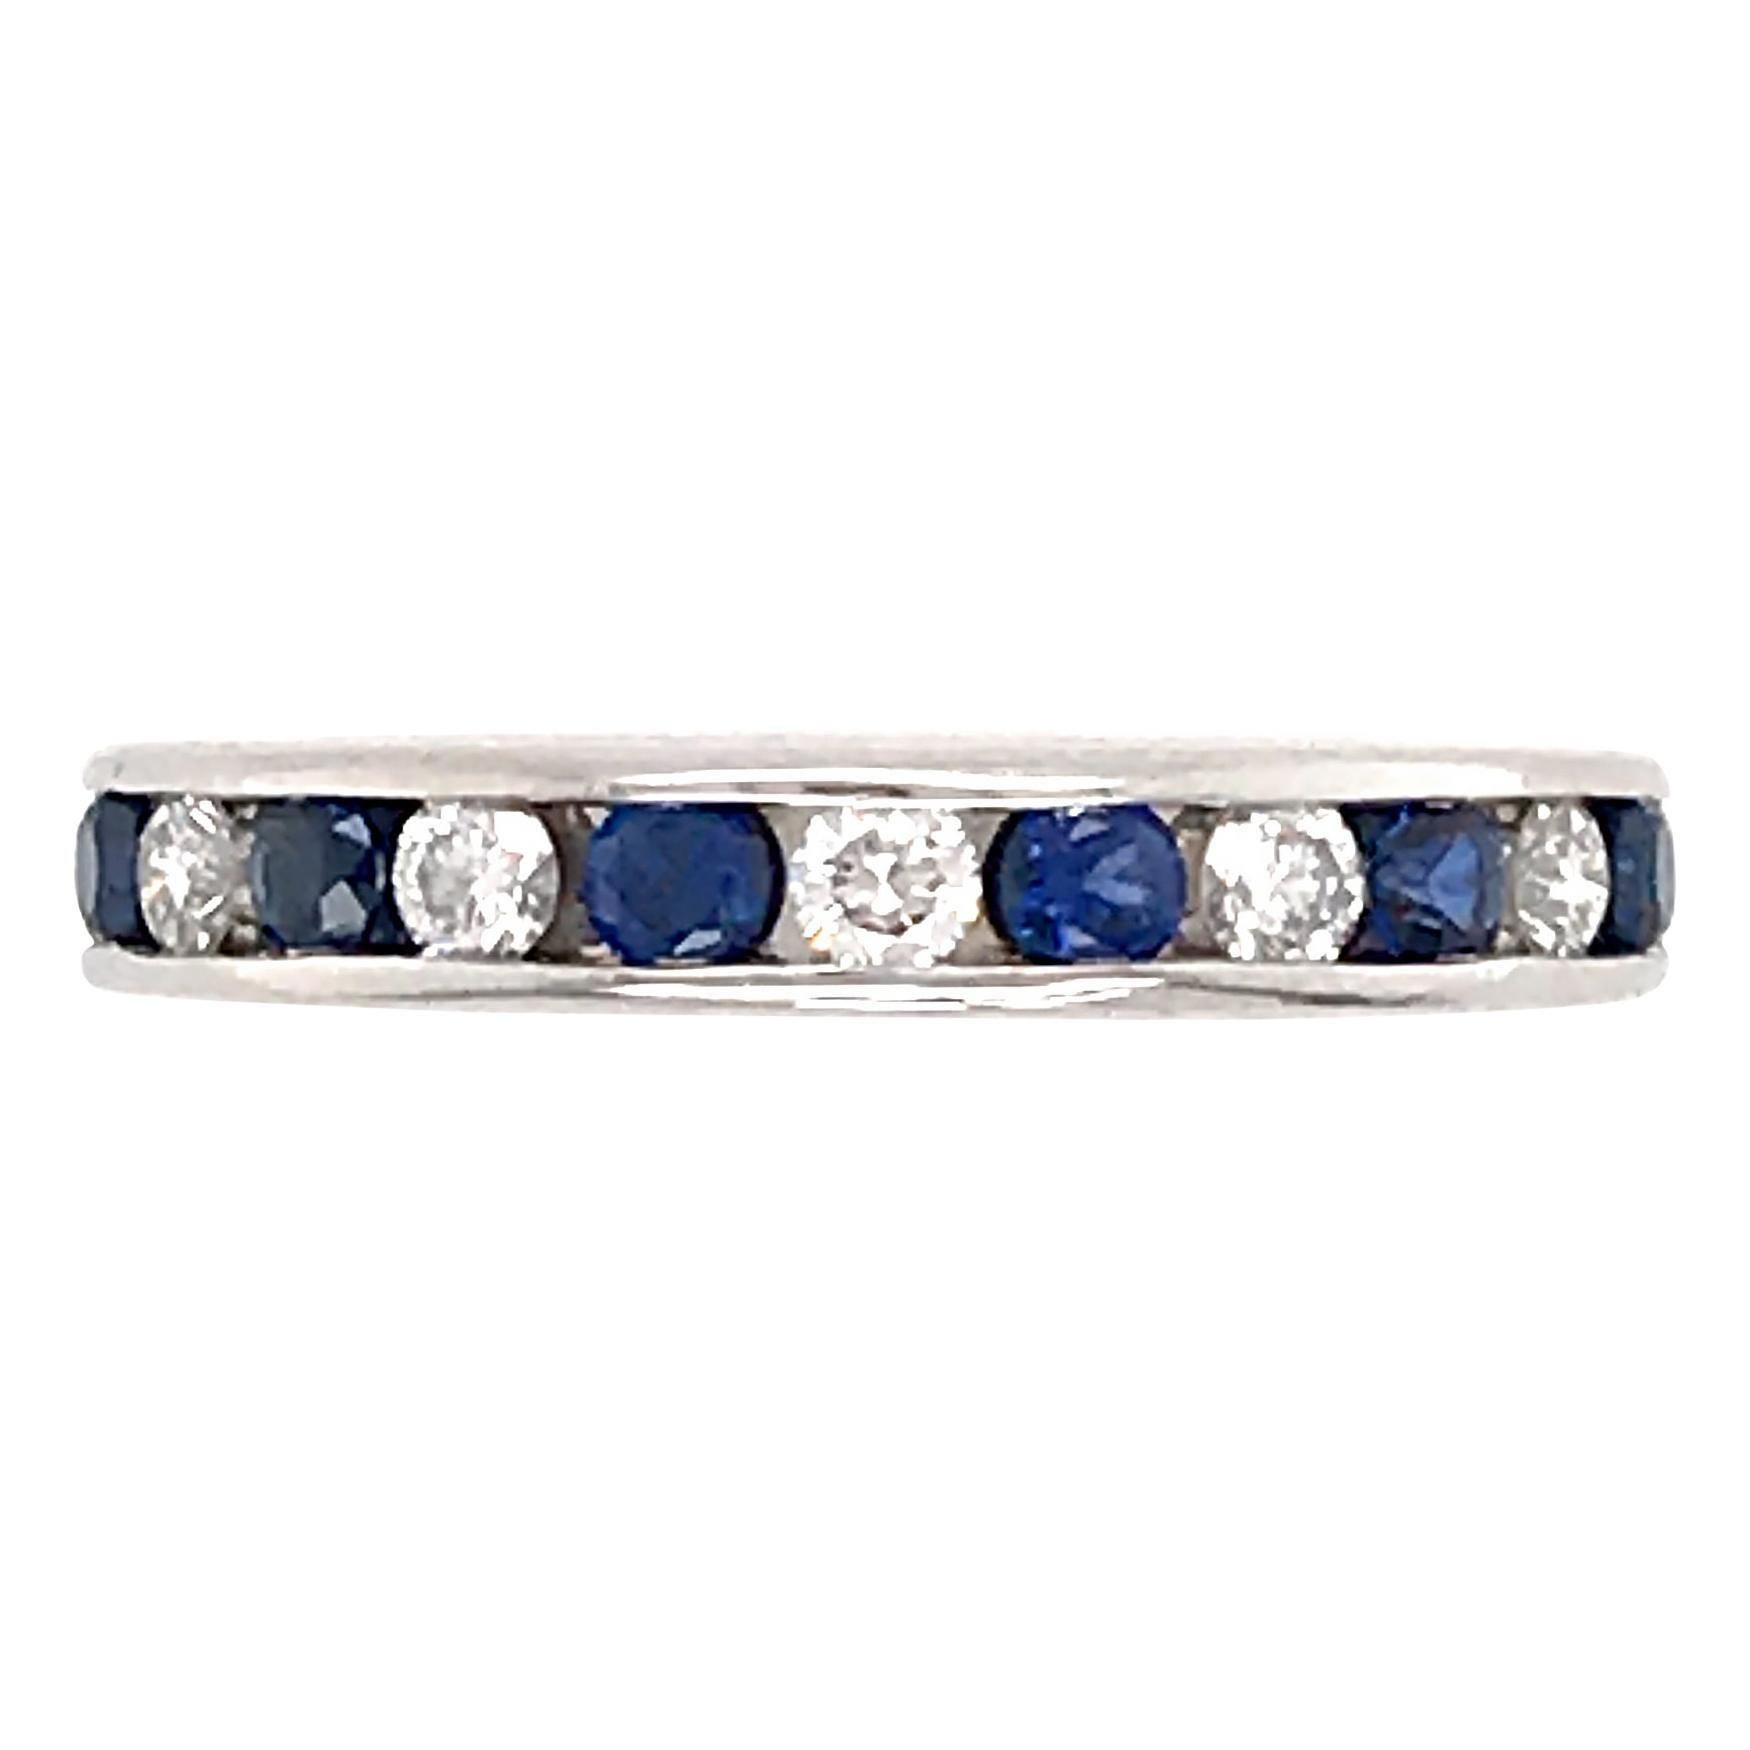 Tiffany & Co. Platinum Diamond and Sapphire Eternity Band